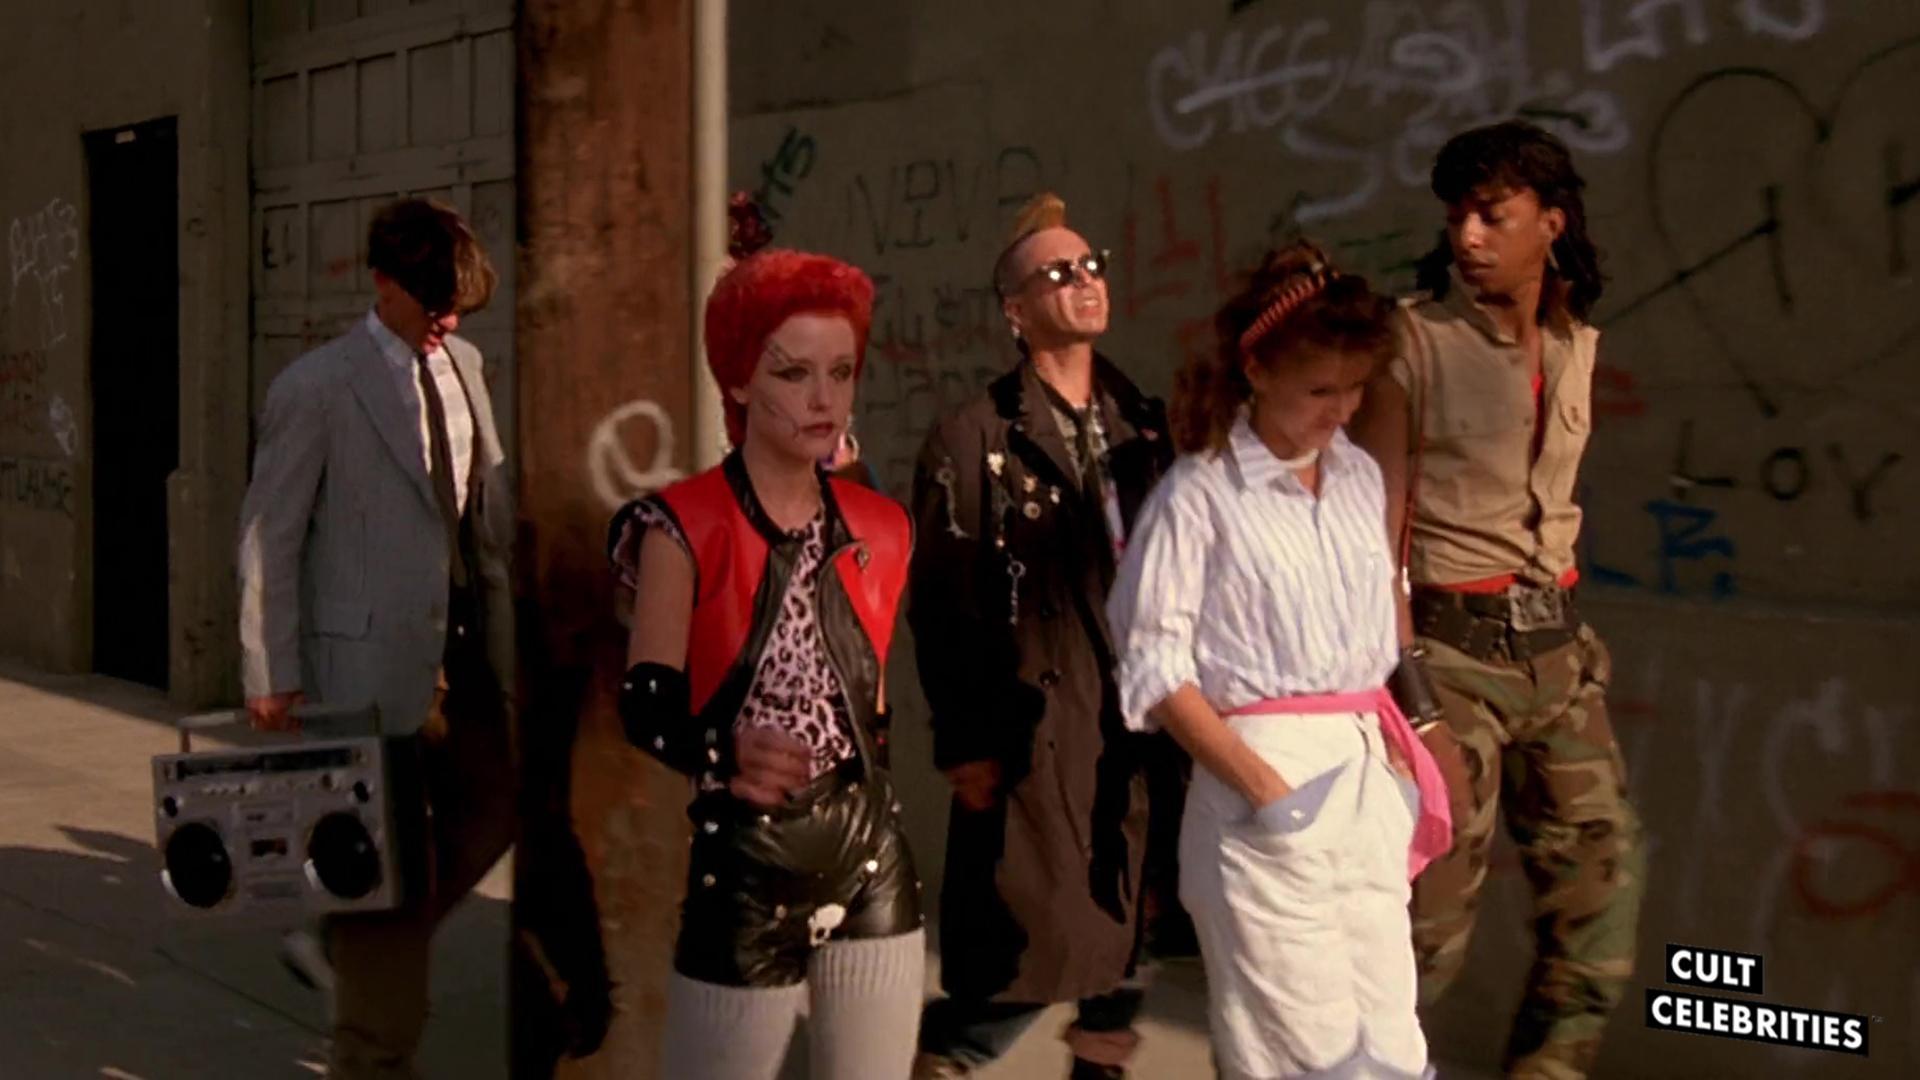 Linnea Quigley in Return of the Living Dead (1985)